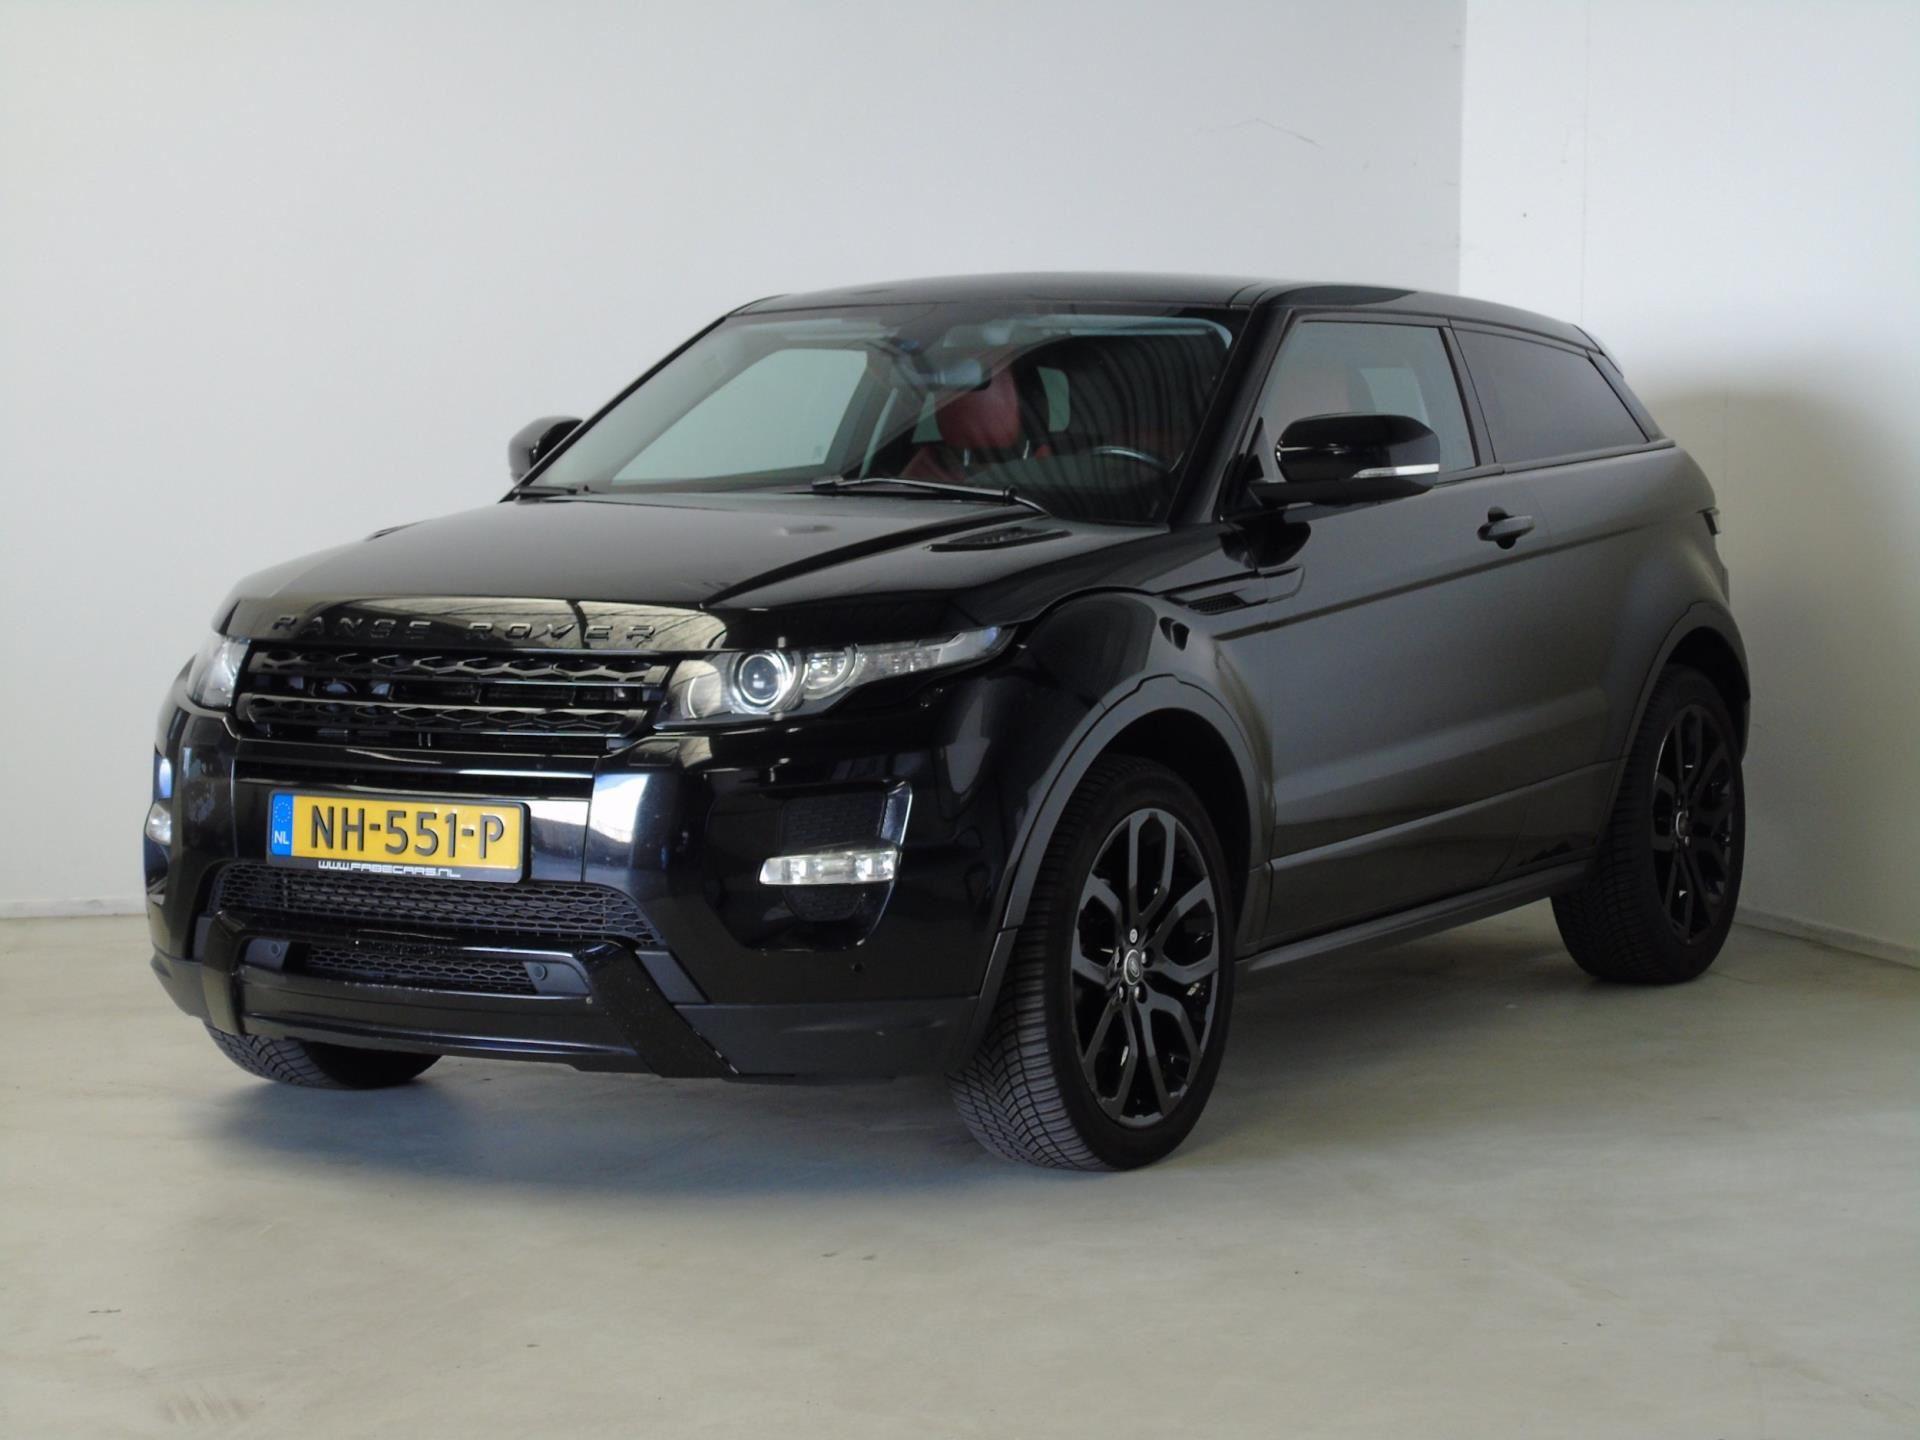 Land Rover Range Rover Evoque Coupé occasion - van Dijk auto's